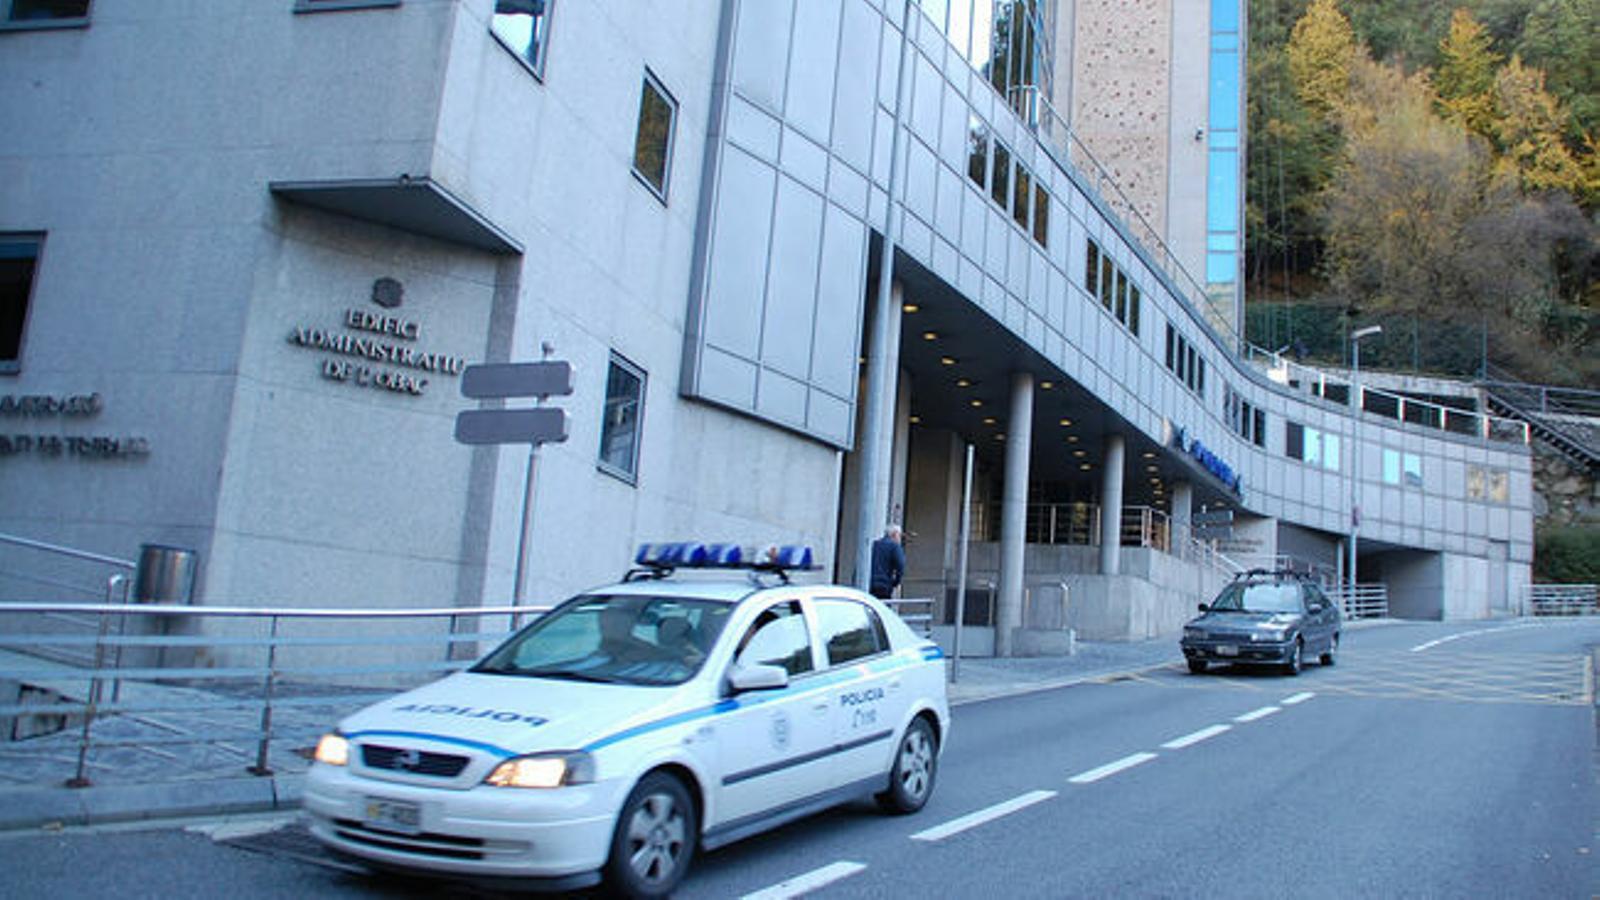 Un vehicle policia passa per davant de la seu central. / ANA